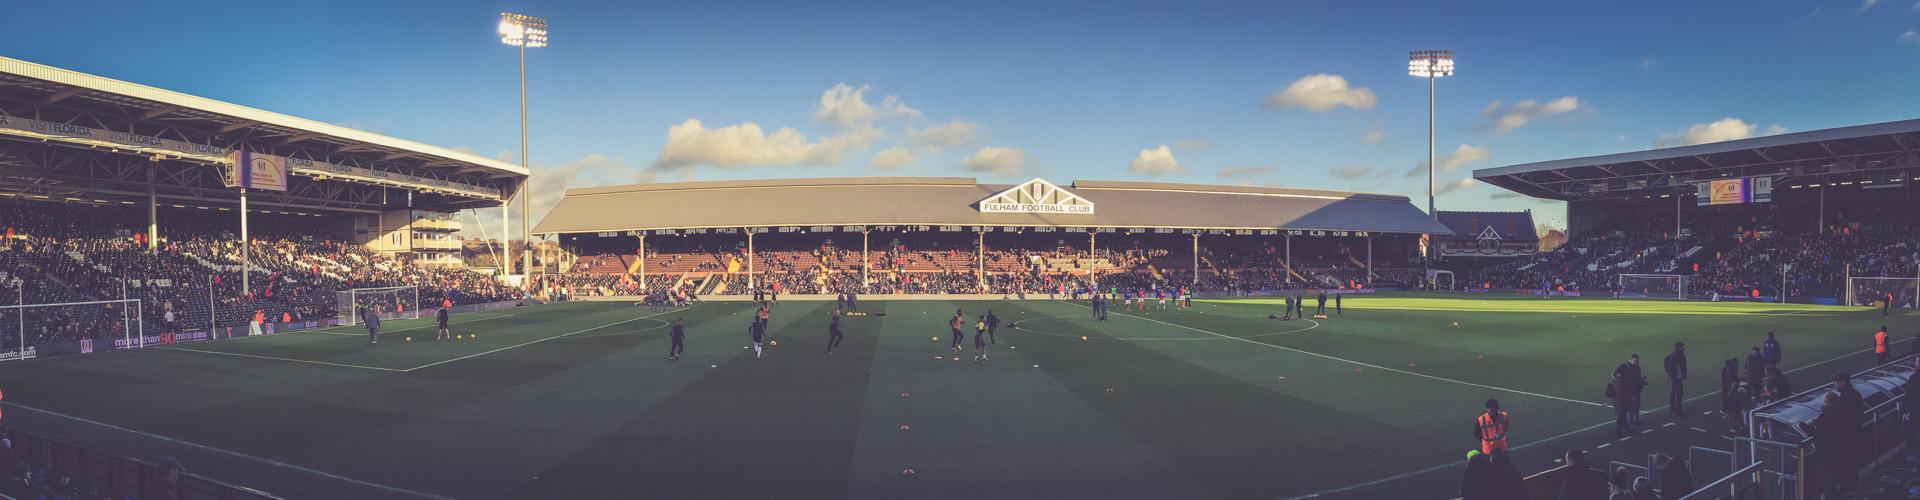 Craven Cottage Panorama - Fulham FC London